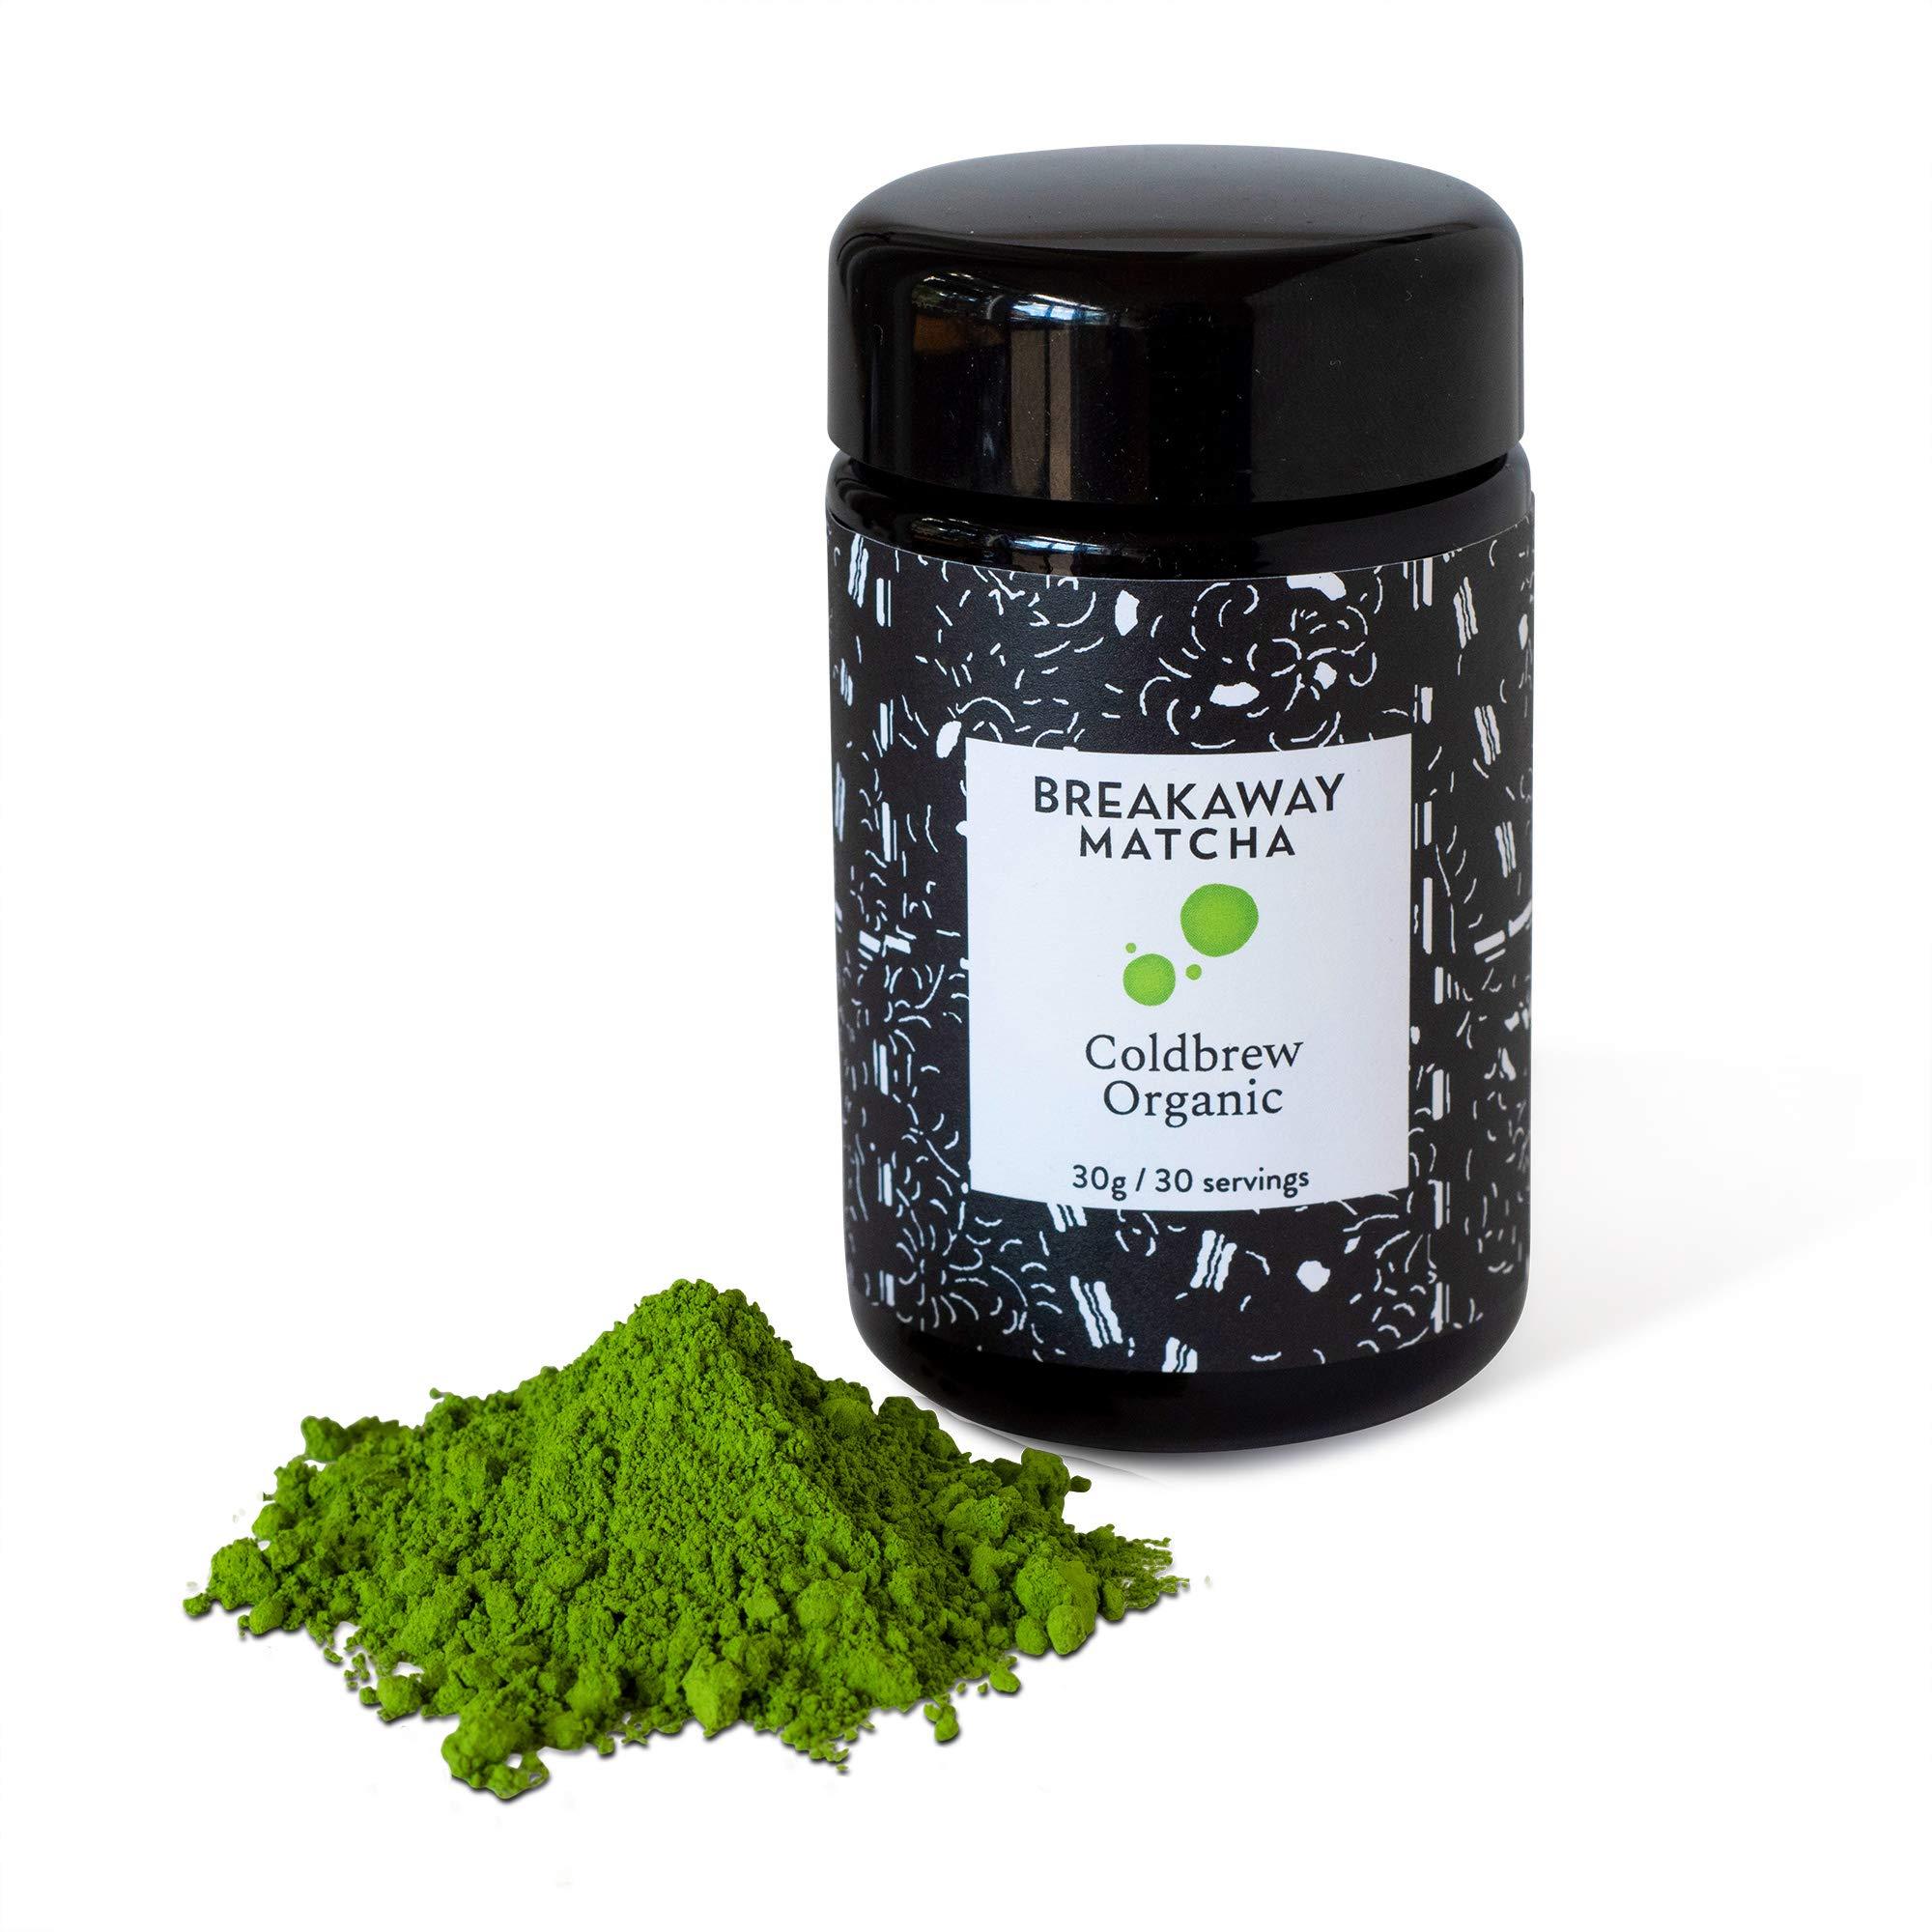 Certified Organic - Direct Farm Sourced From Japan - Breakaway Matcha Coldbrew Organic Iced Green Tea Powder - Highest Grade - Beyond Ceremonial (30g)